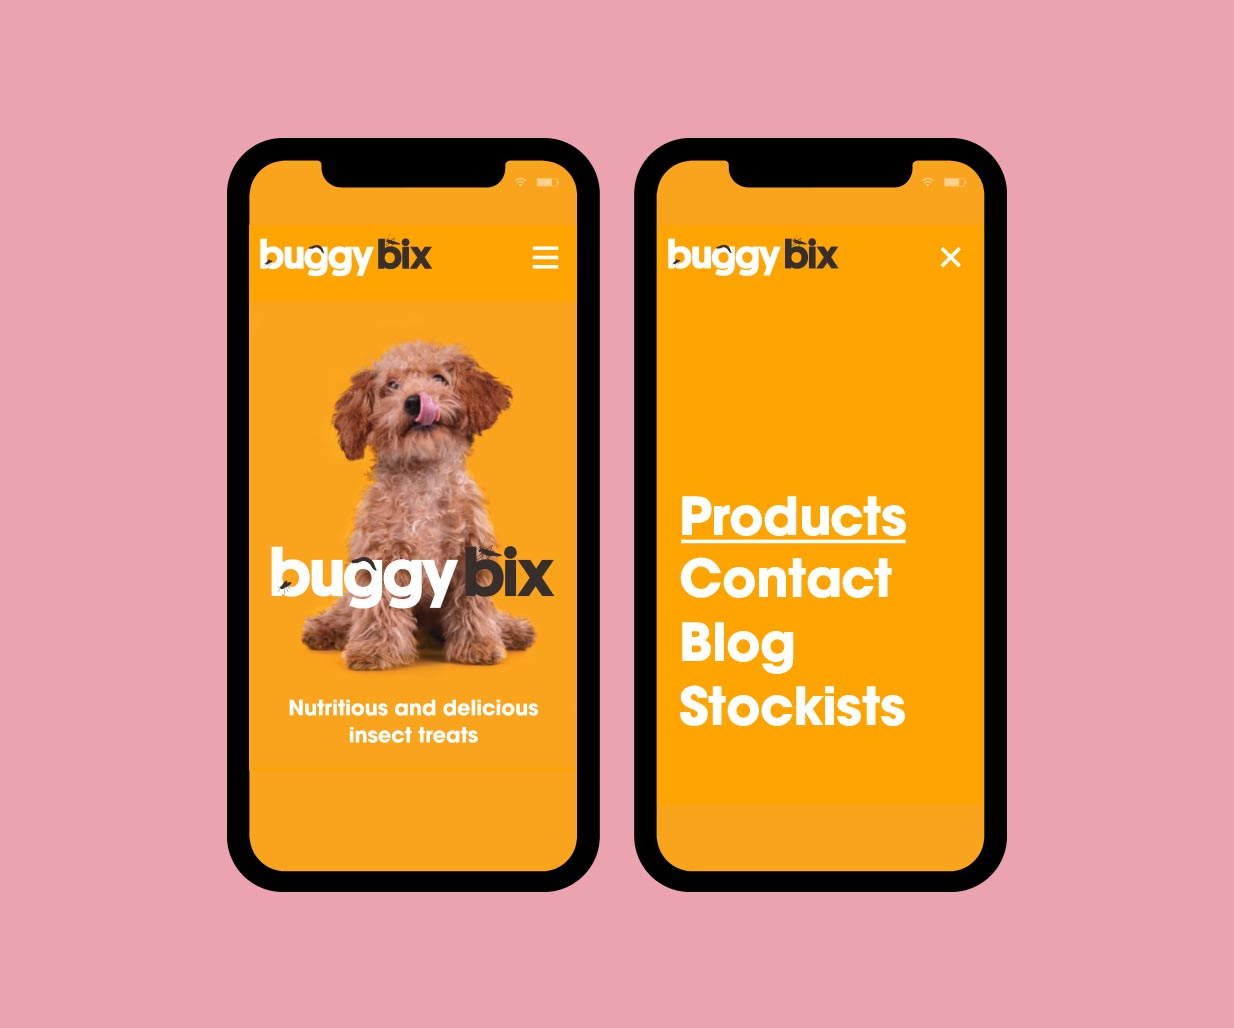 Website Design project image for pet food website design by Percept creative agencies Sydney, case study image F